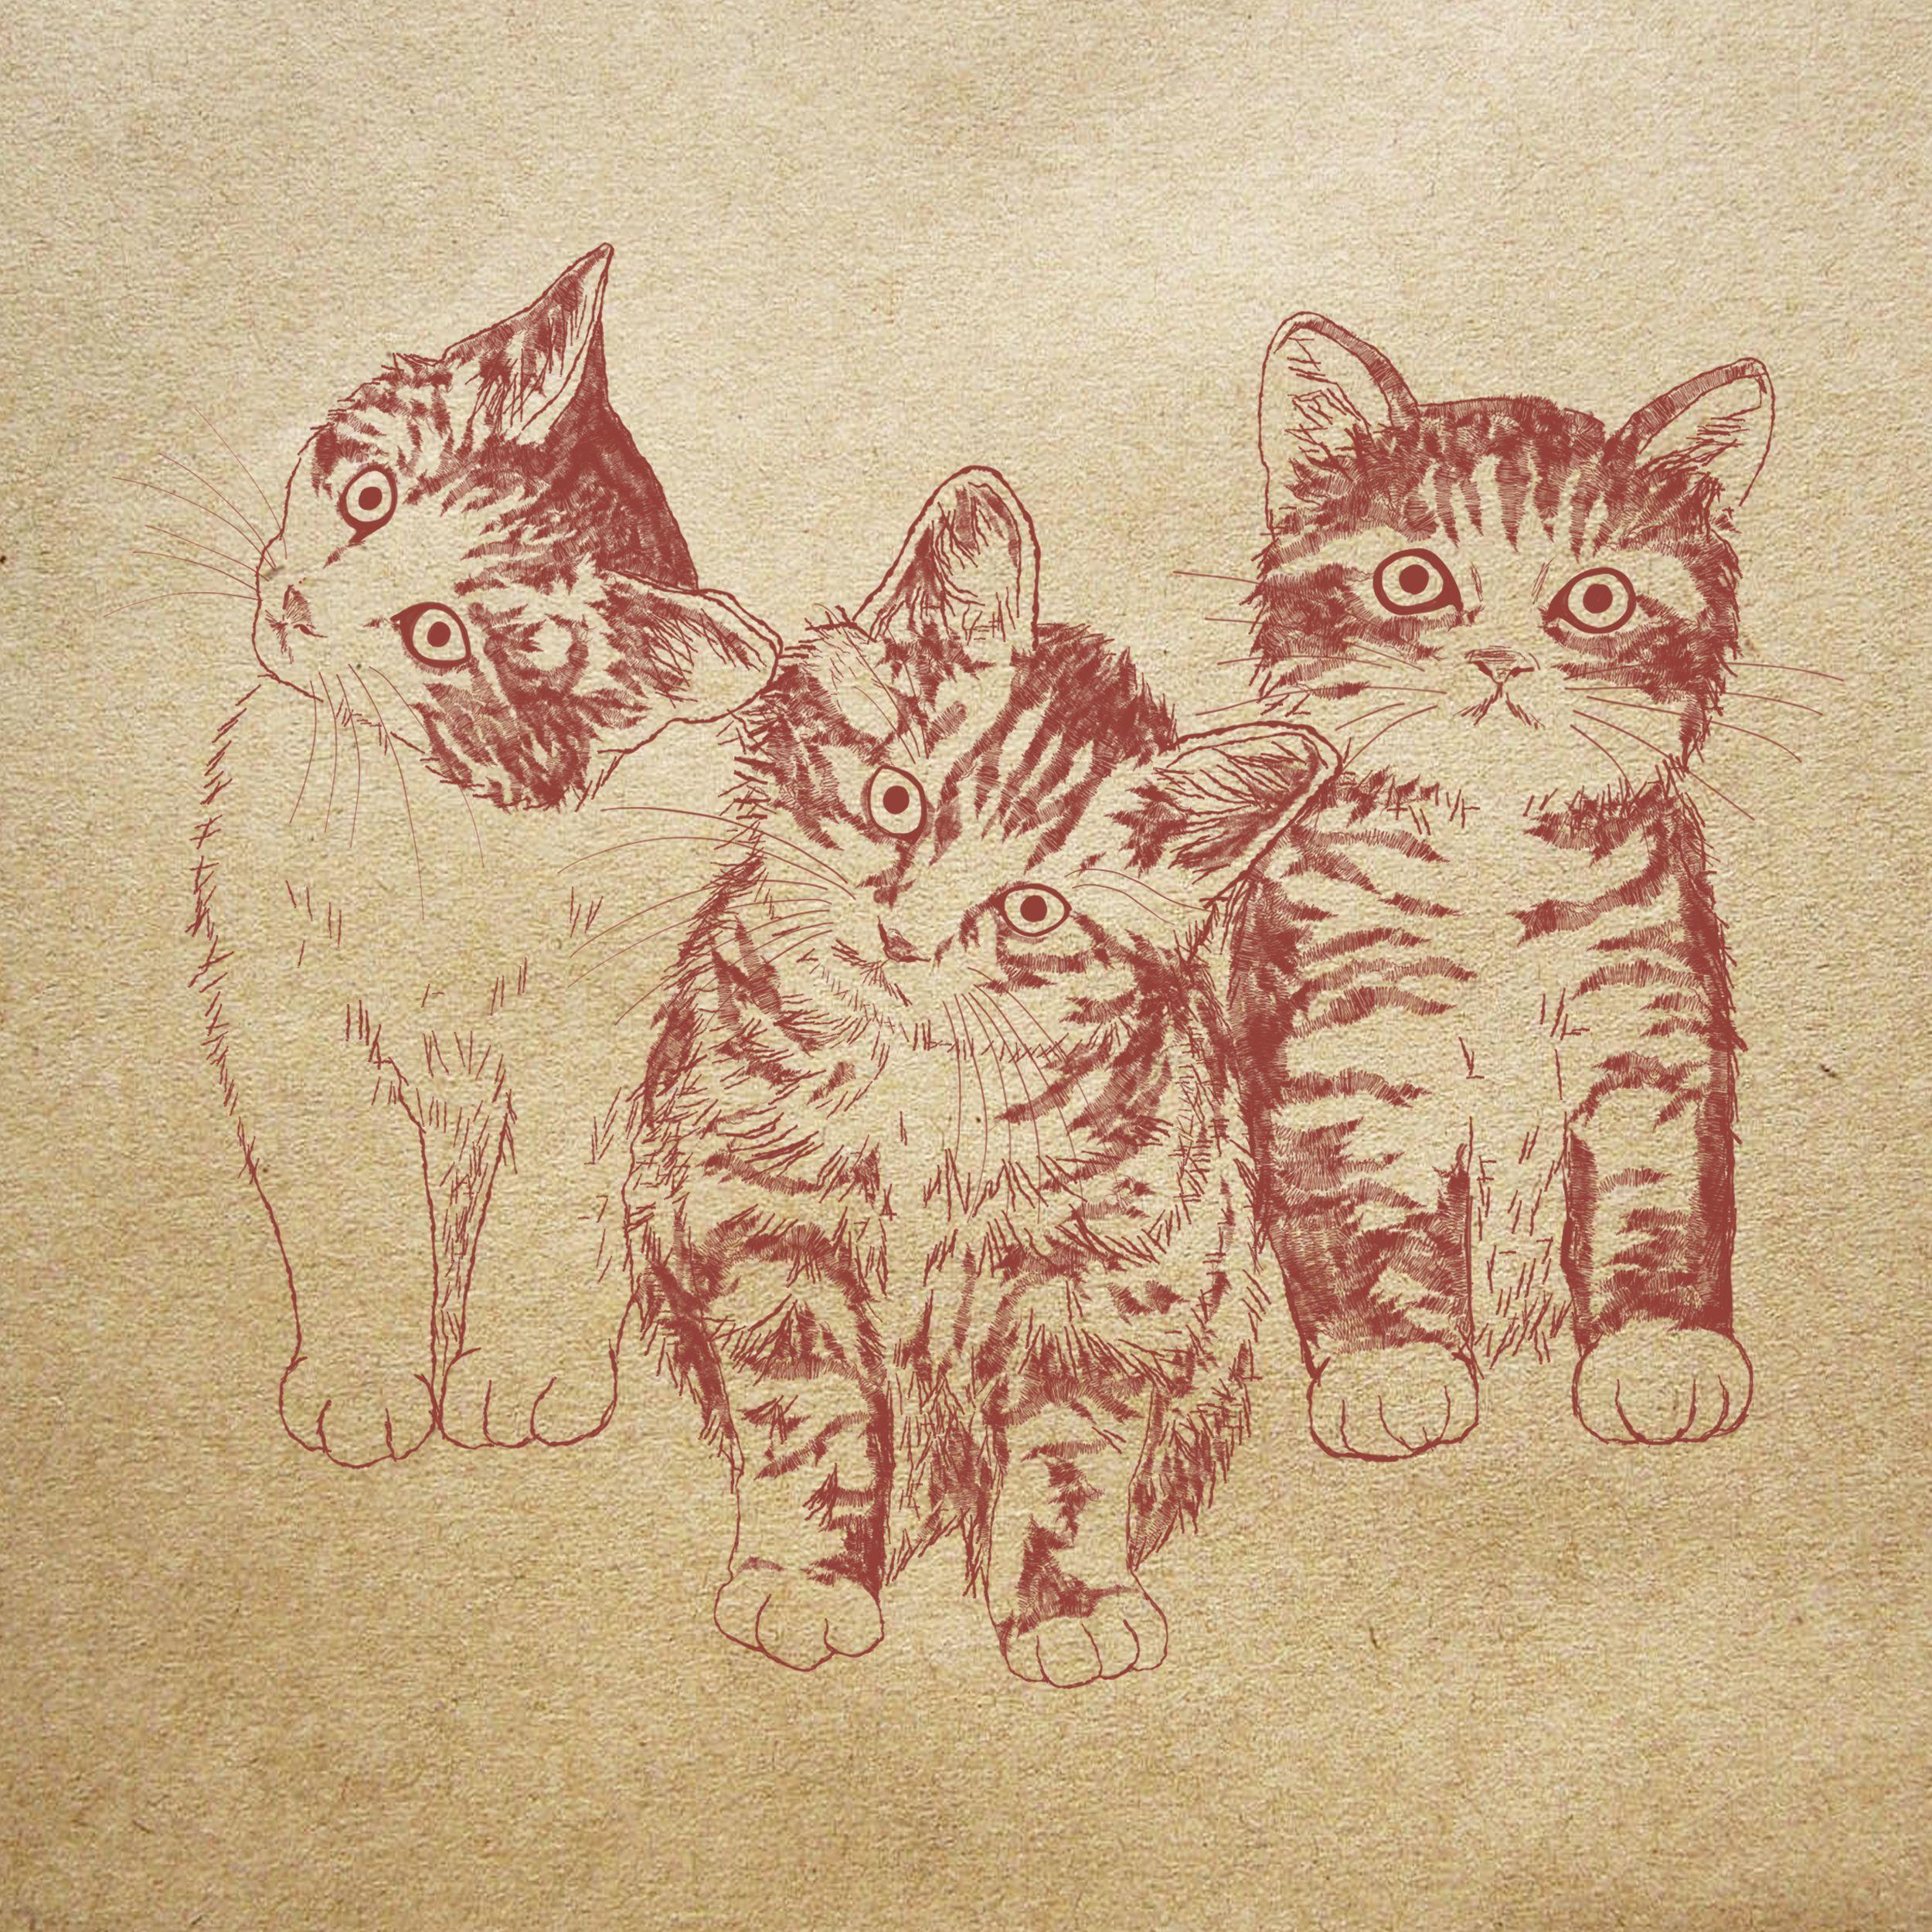 Kittens Illustration Of 365cat Art インスタ365cat Artからの子猫